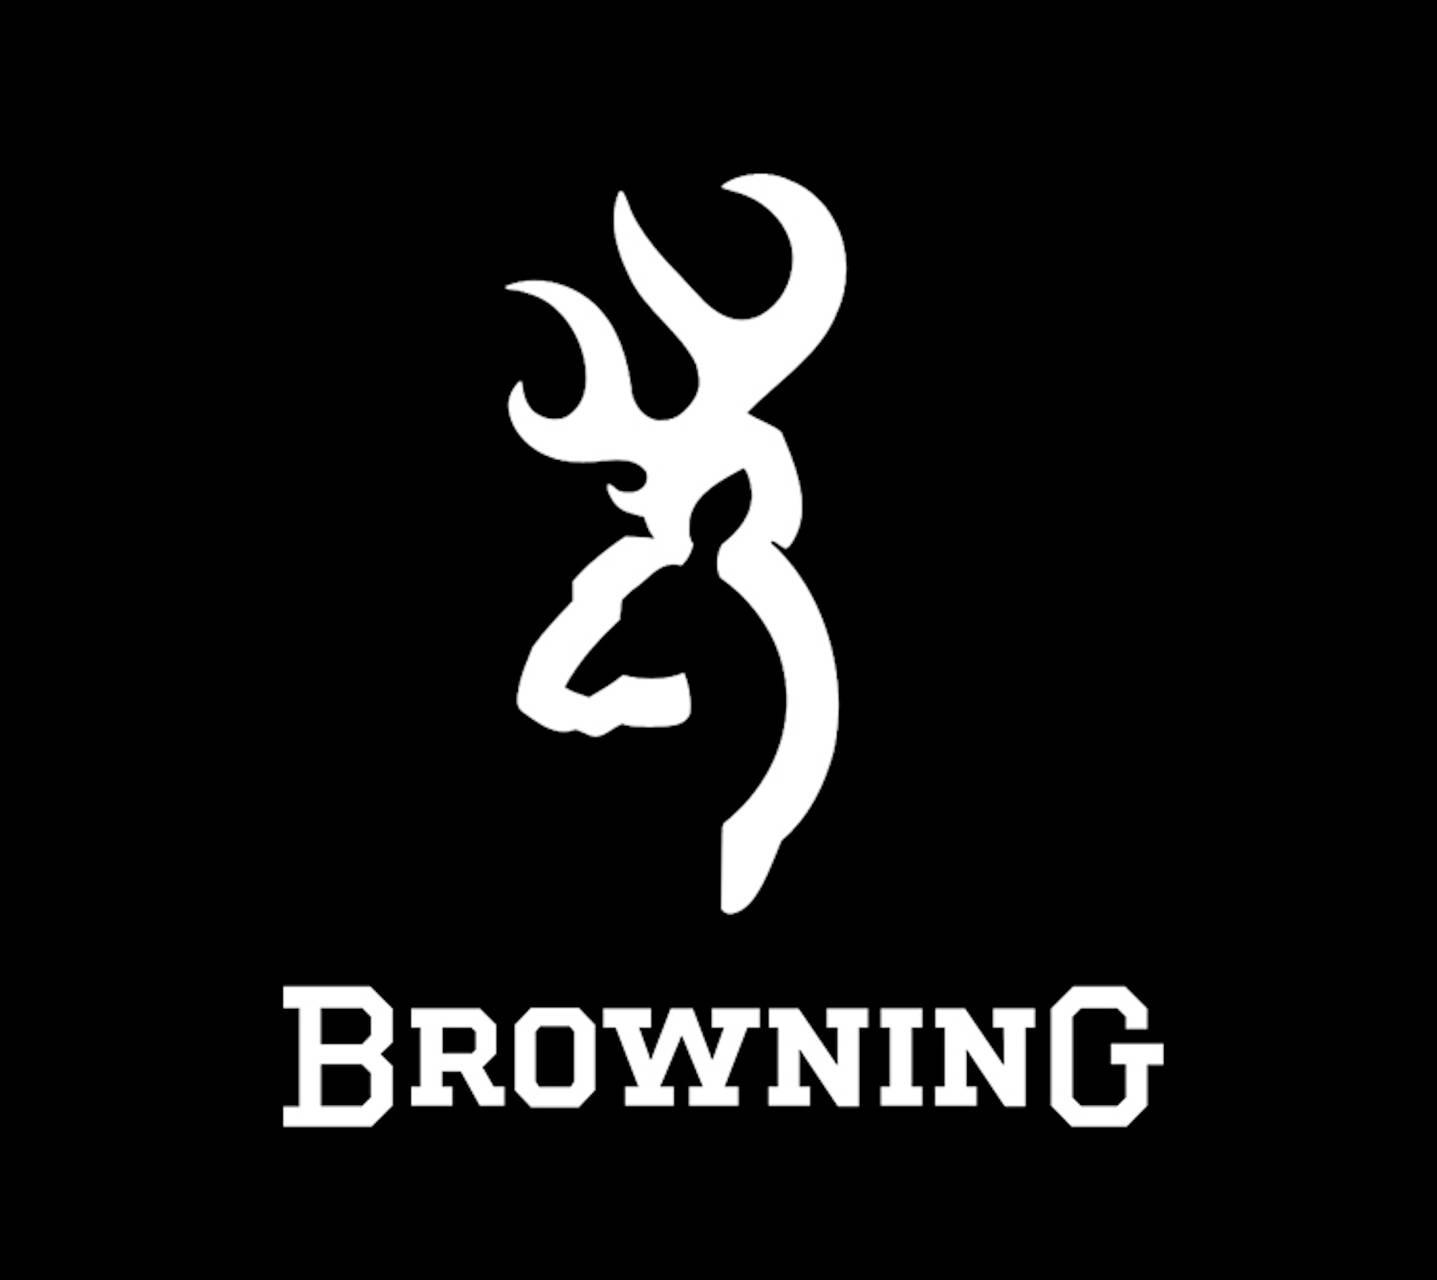 Browning Logo Wallpaper By Bigirish91 83 Free On Zedge